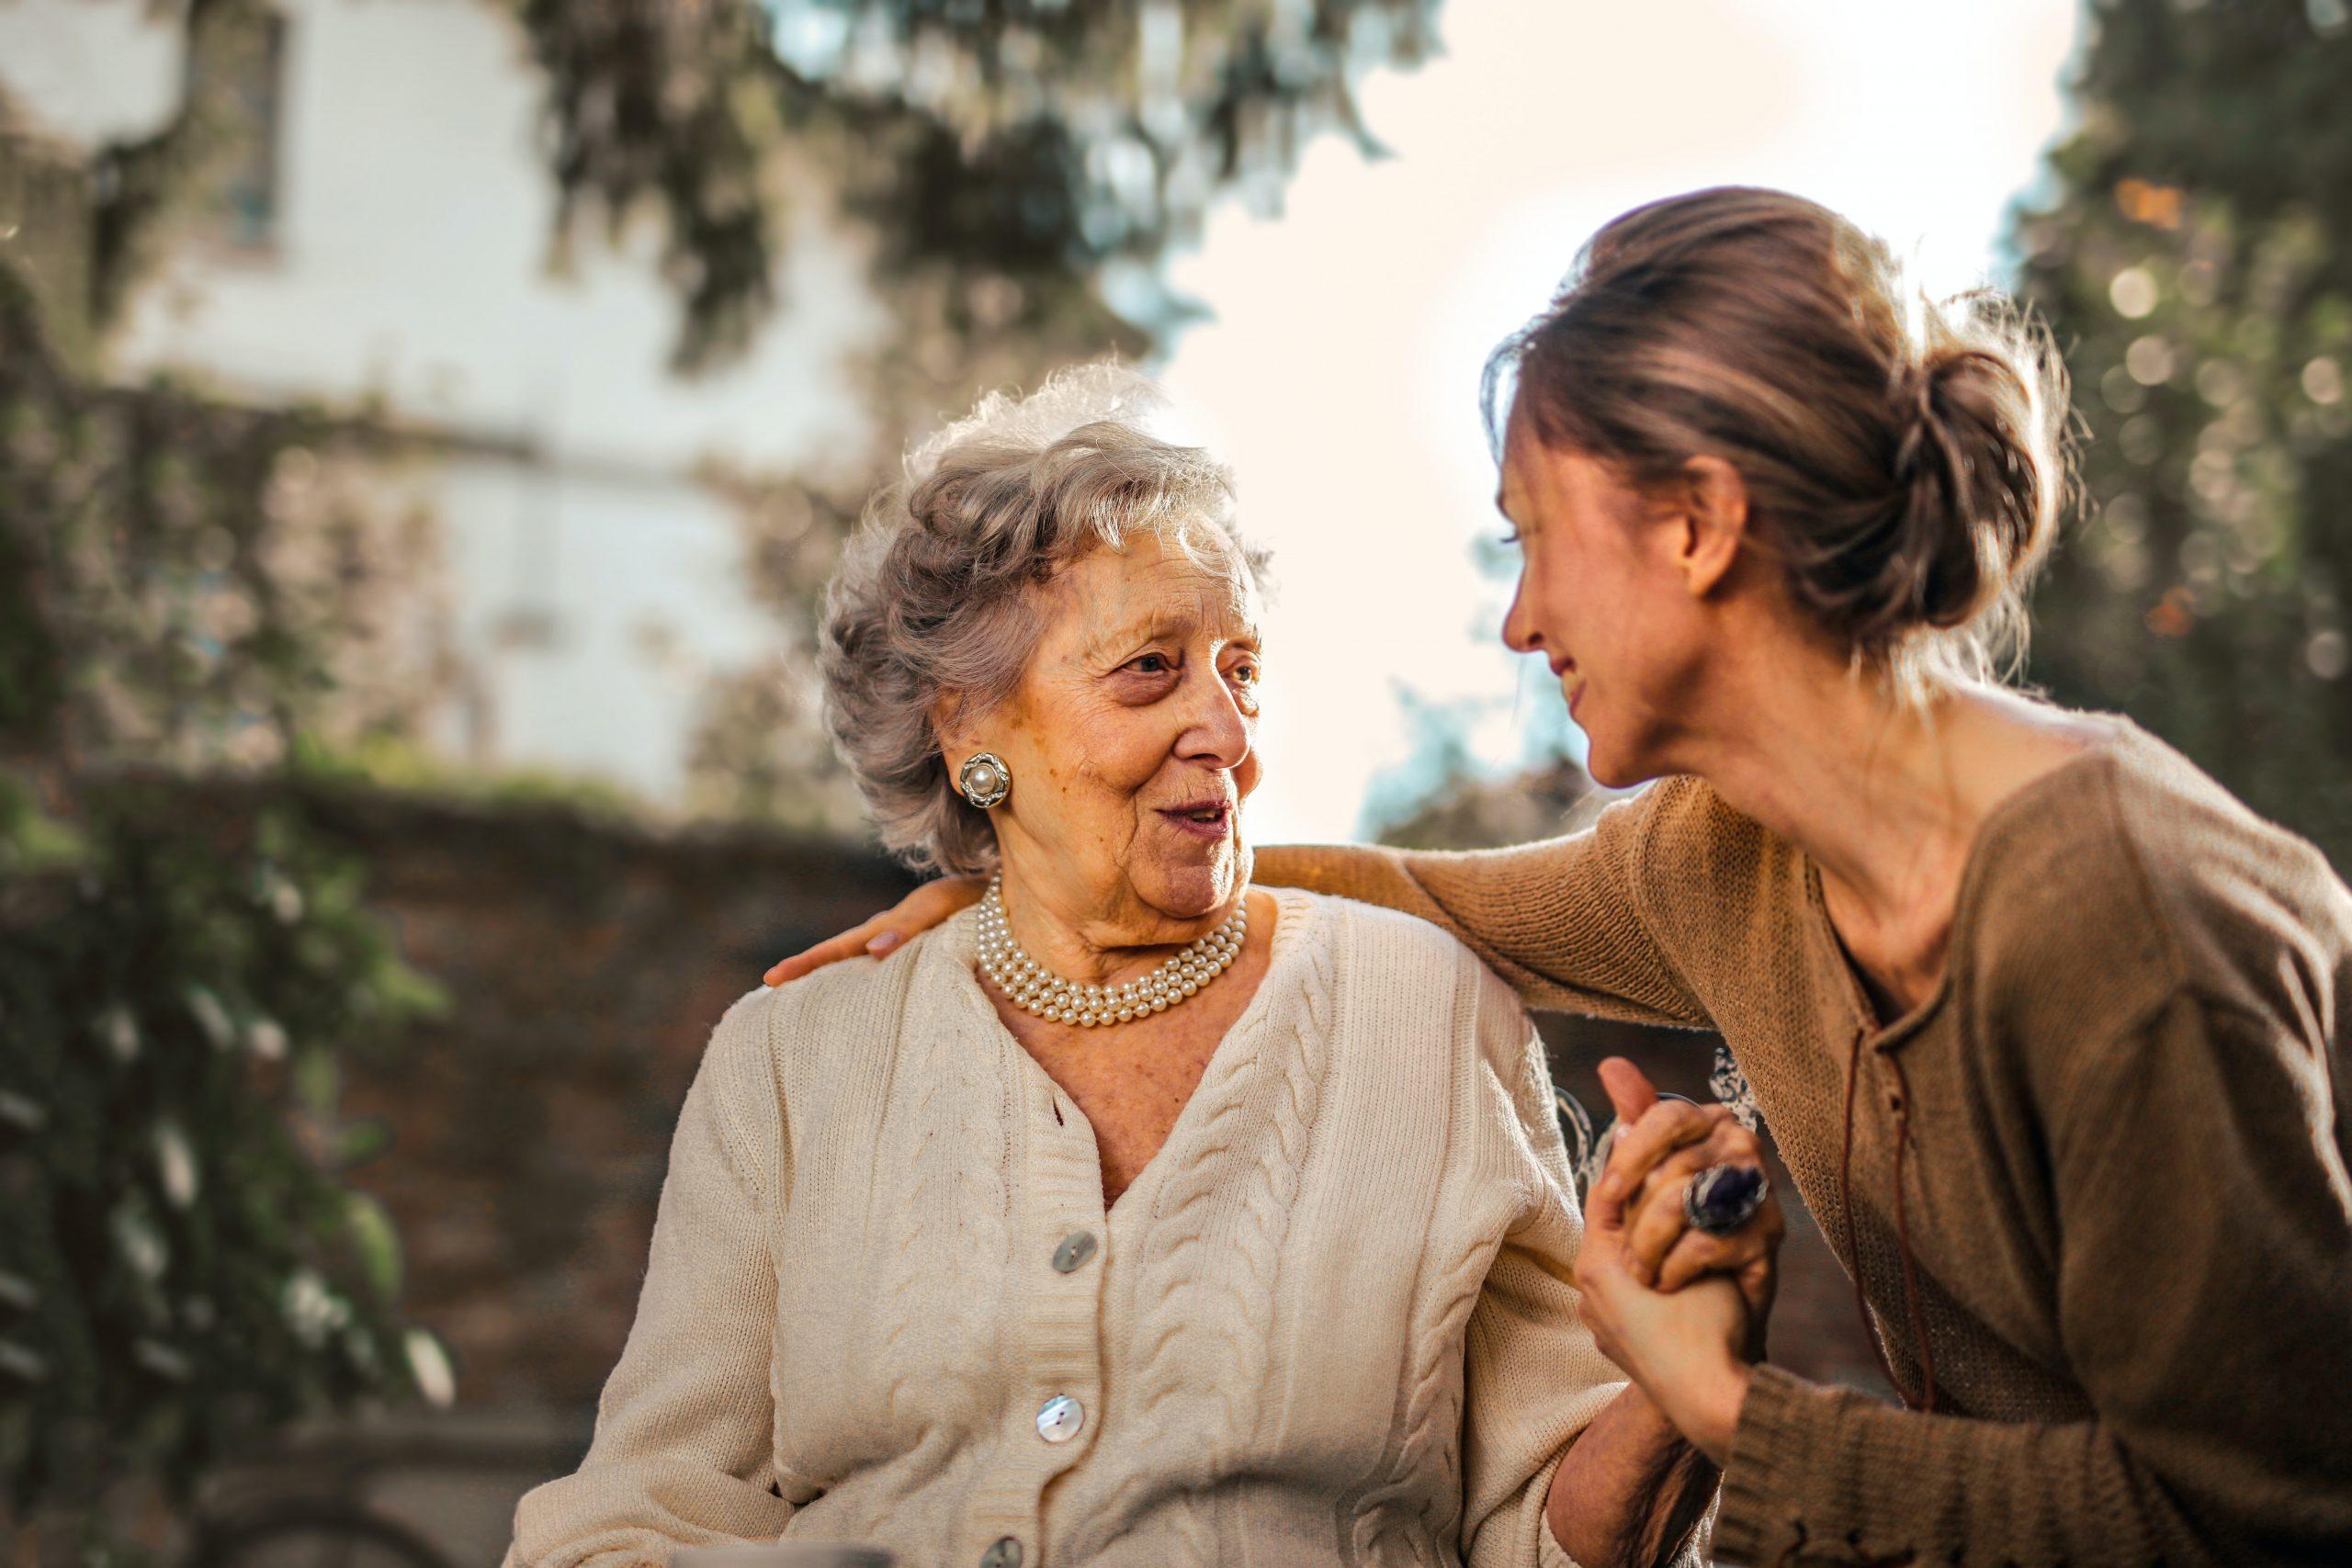 Women providing comfort to elderly woman